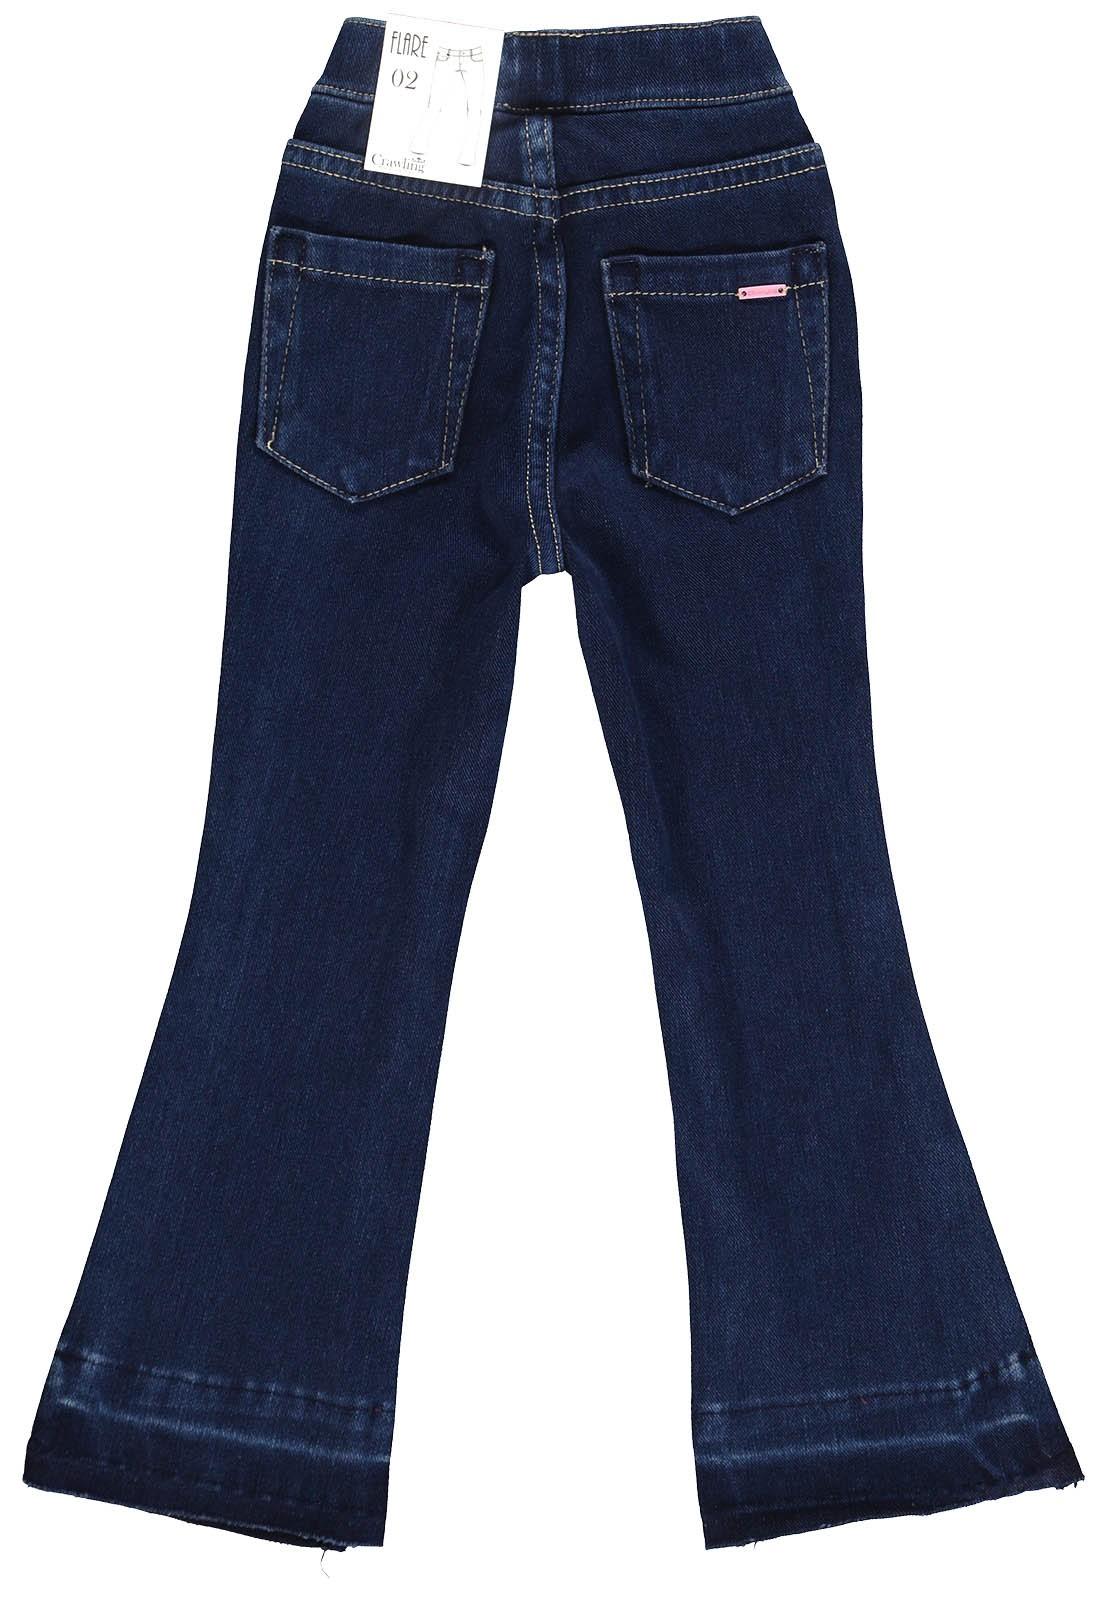 Calça Jeans Moletom Feminina Crawling Flare